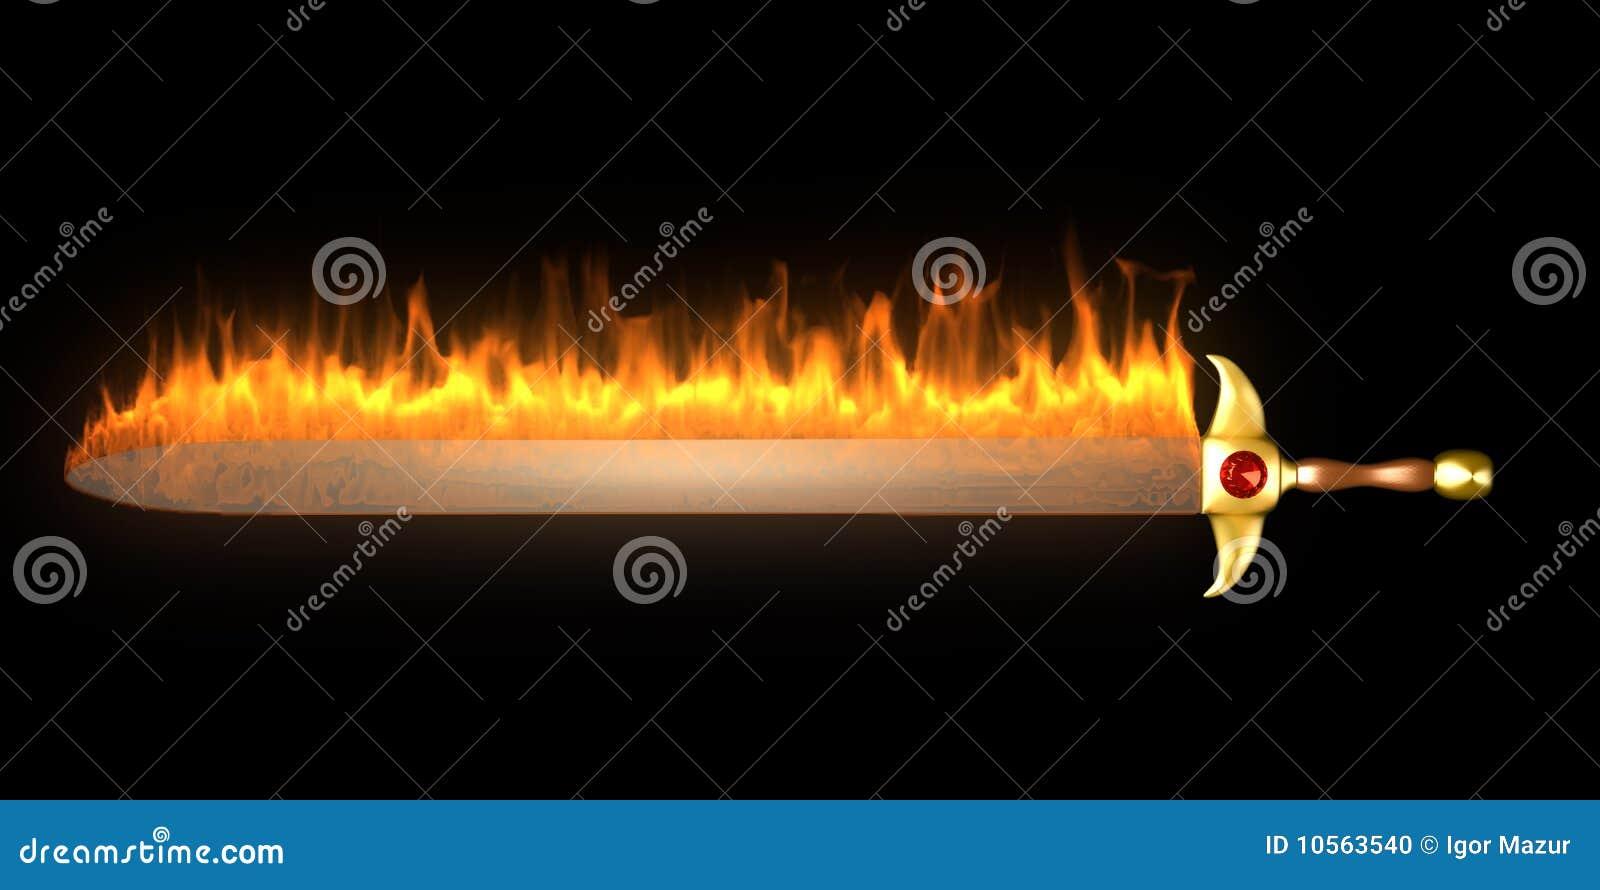 Burning Fire Sword Stock Photo Image 10563540